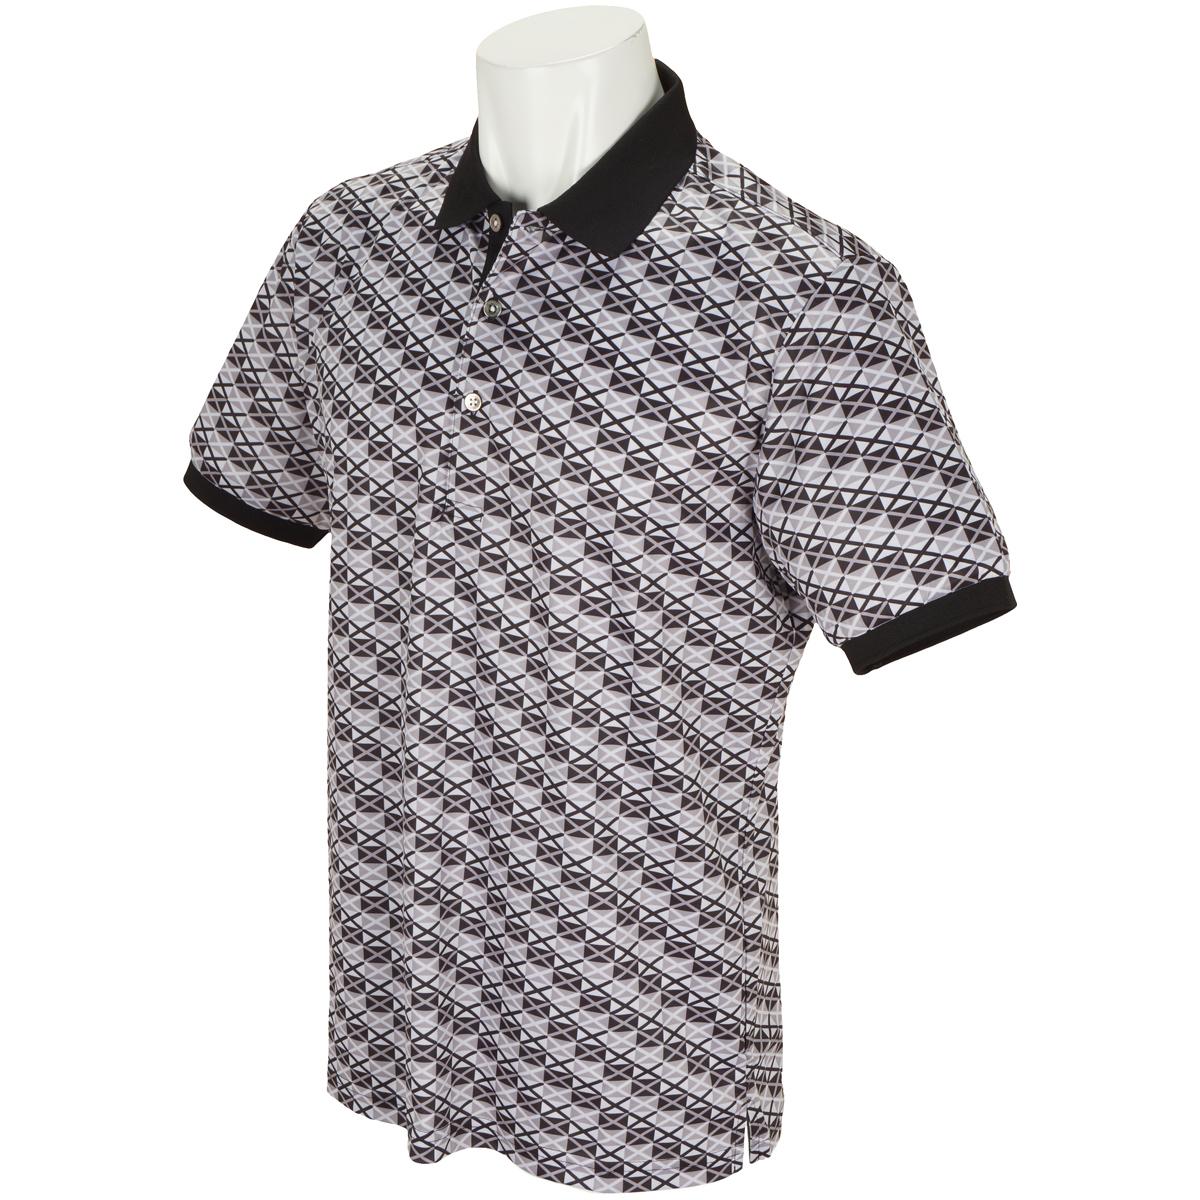 WhiteLabel COOLMAX鹿の子クロスプリント半袖ポロシャツ